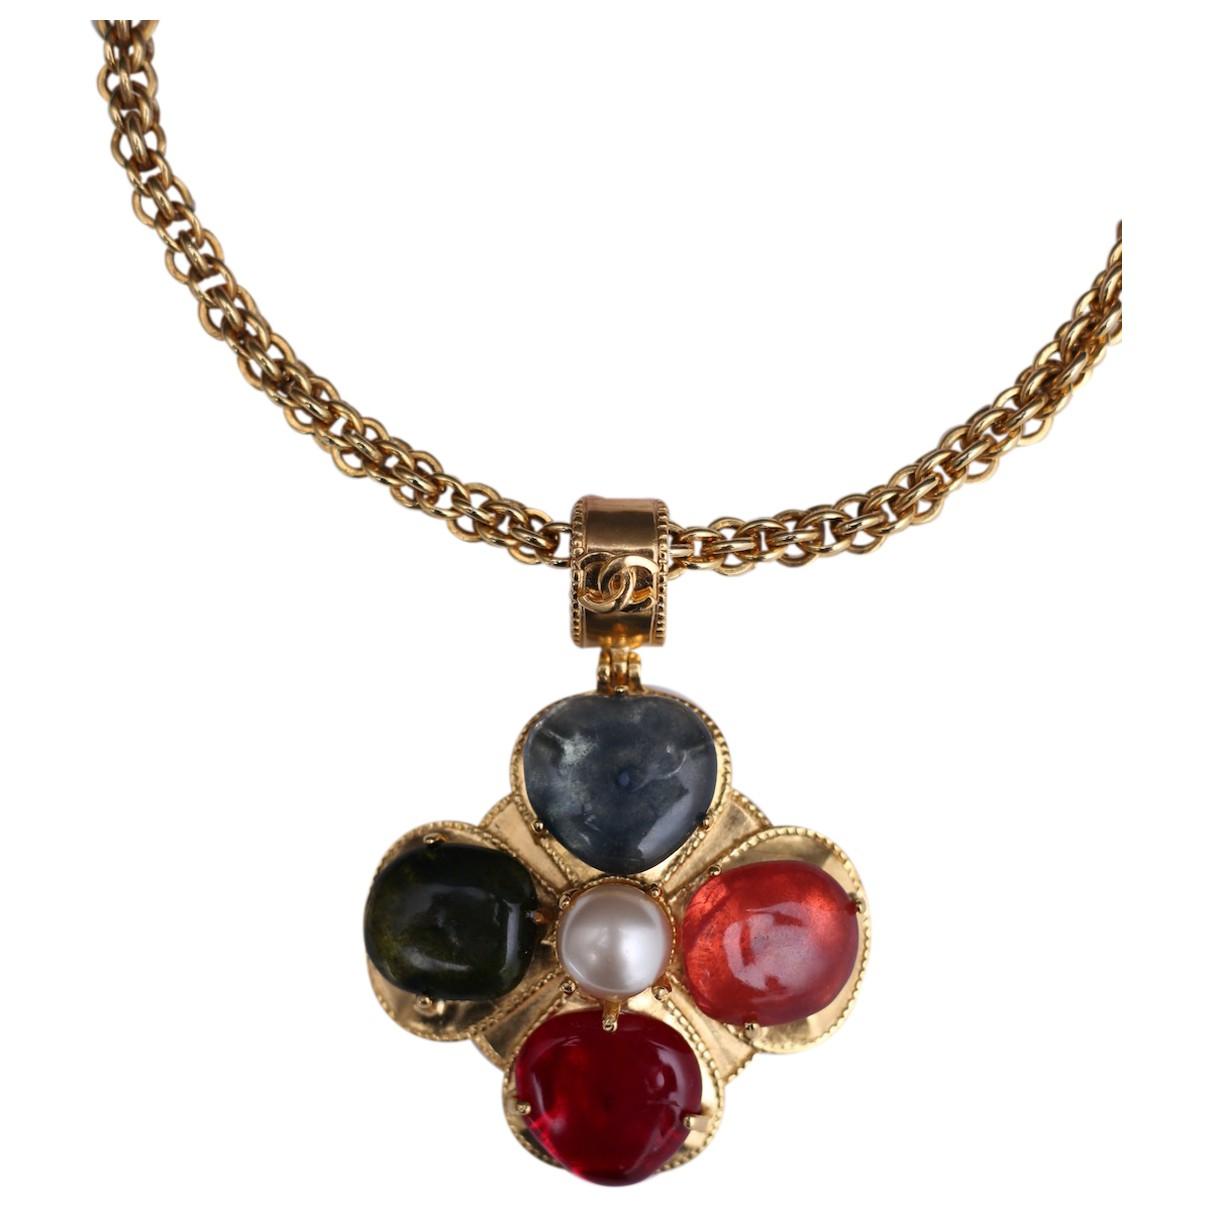 Chanel Baroque Kette in  Bunt Metall